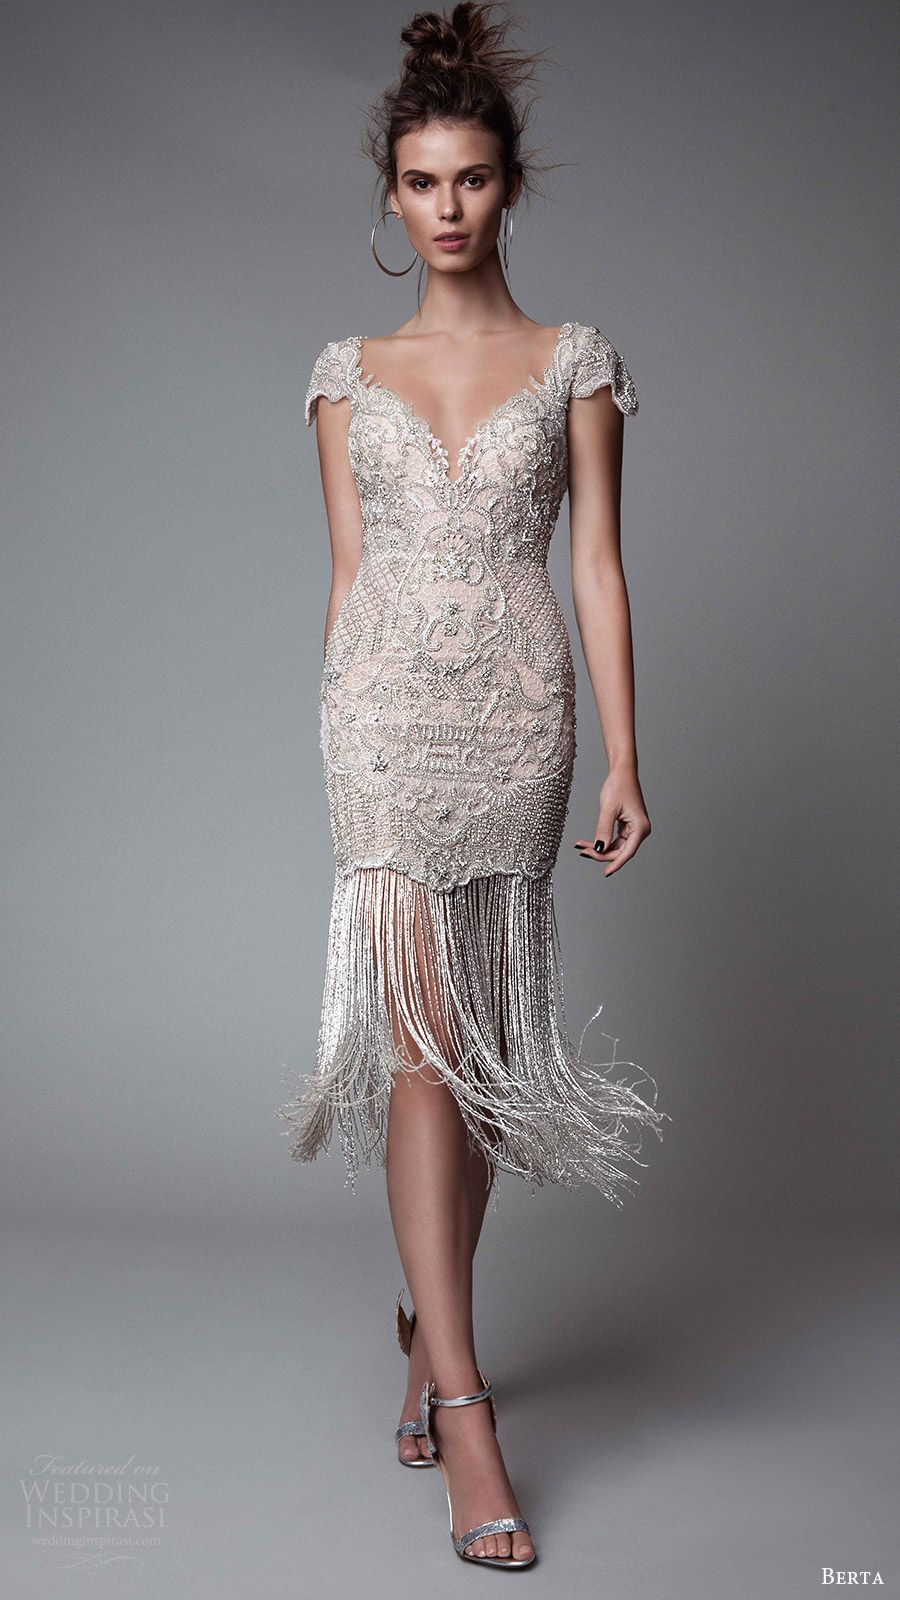 Berta bridal rtw my wedding outfit if i had pinterest